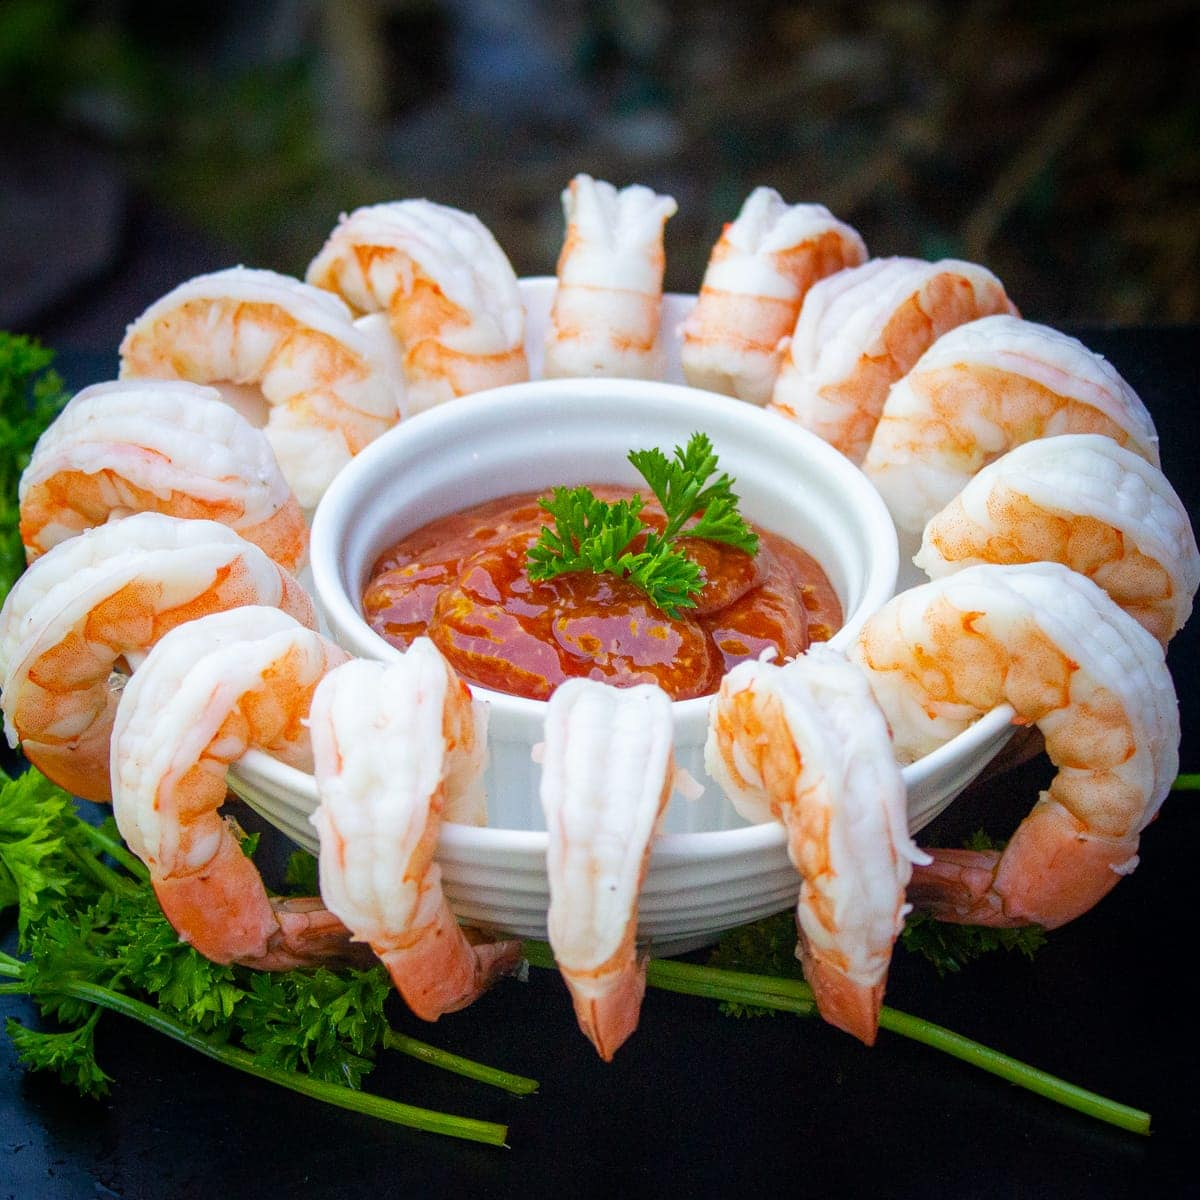 Shrimp Cocktail Recipe (with homemade cocktail sauce)